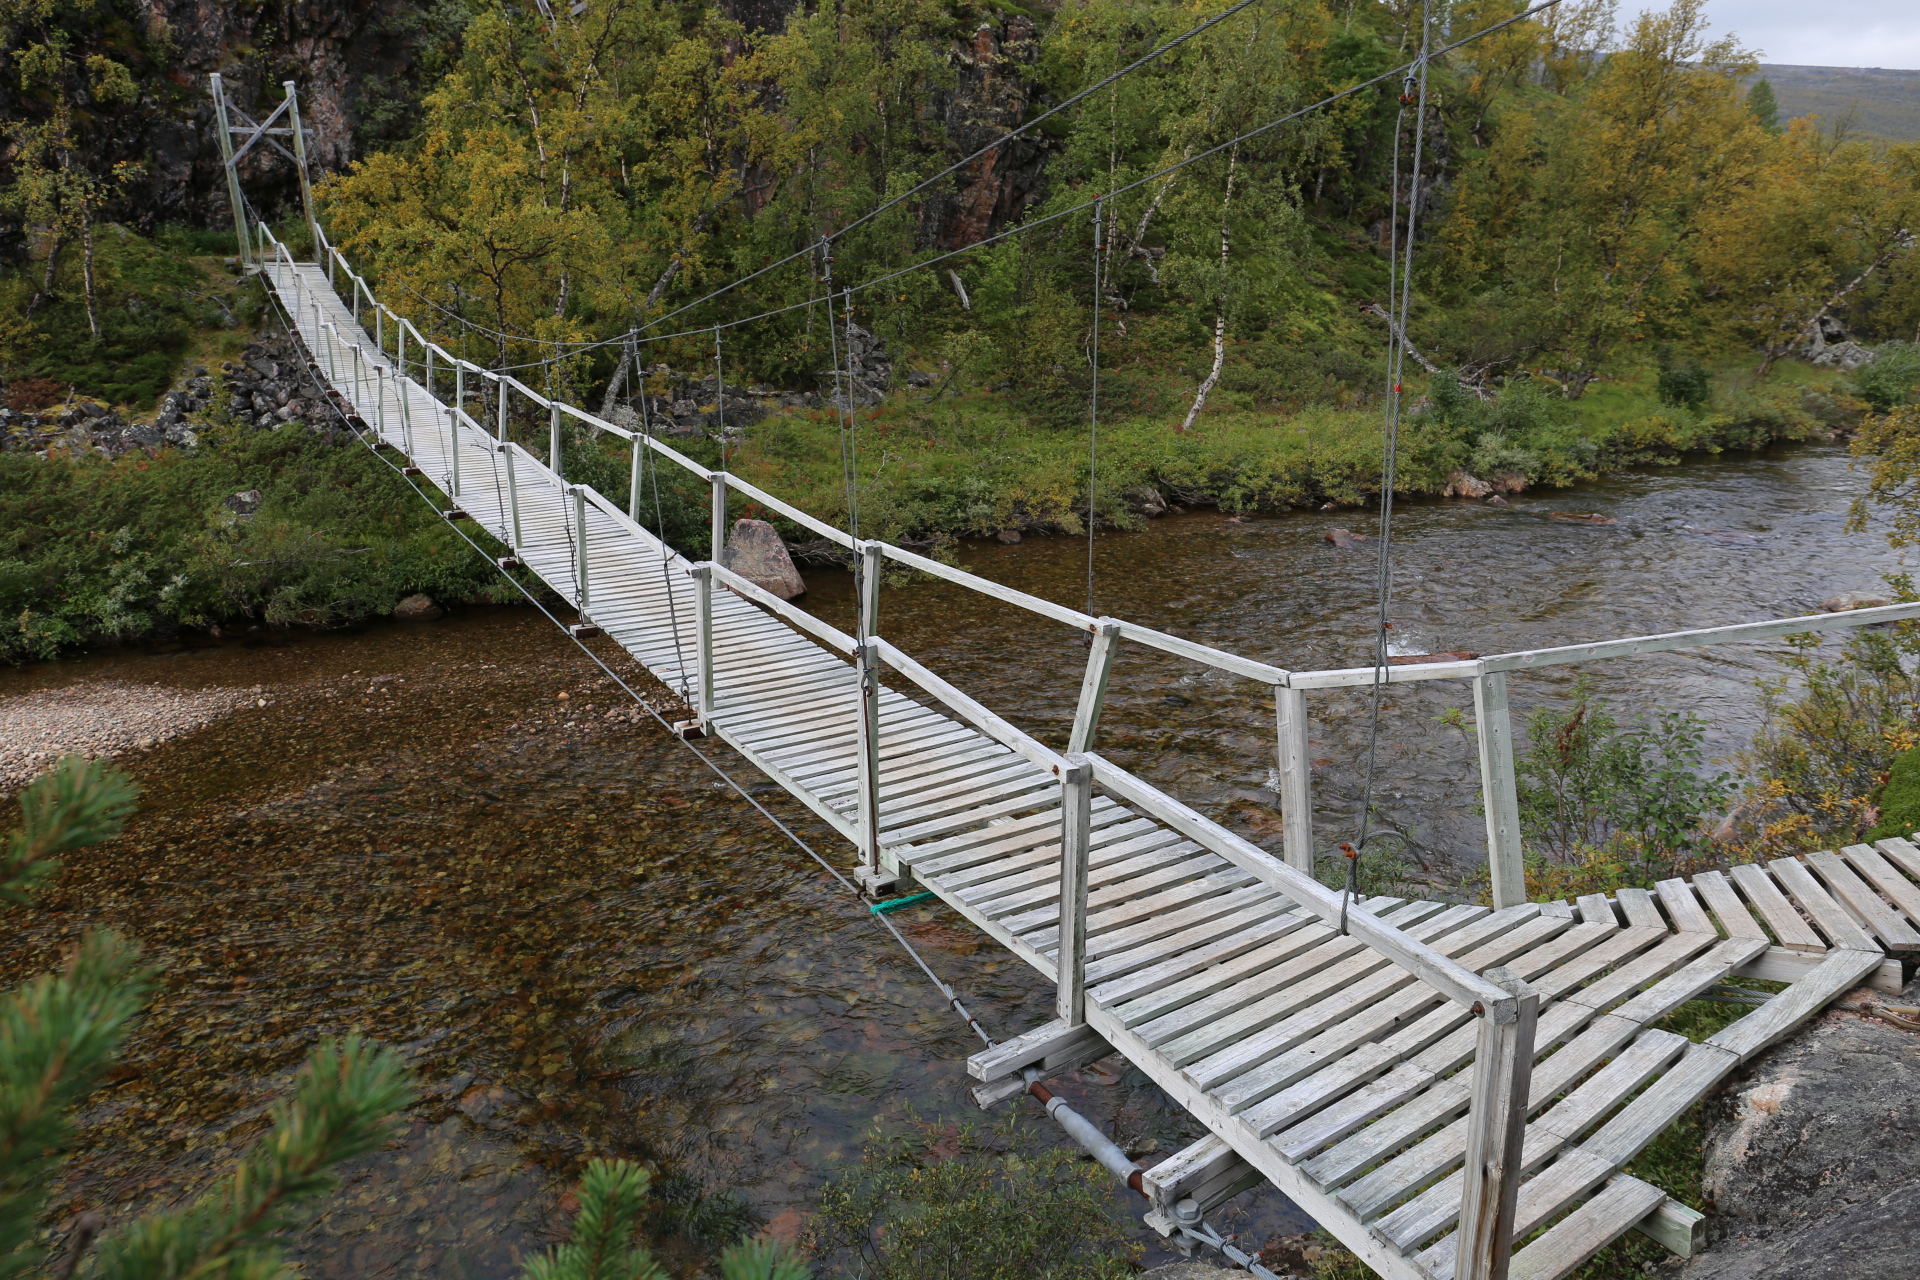 Bron över Divielva